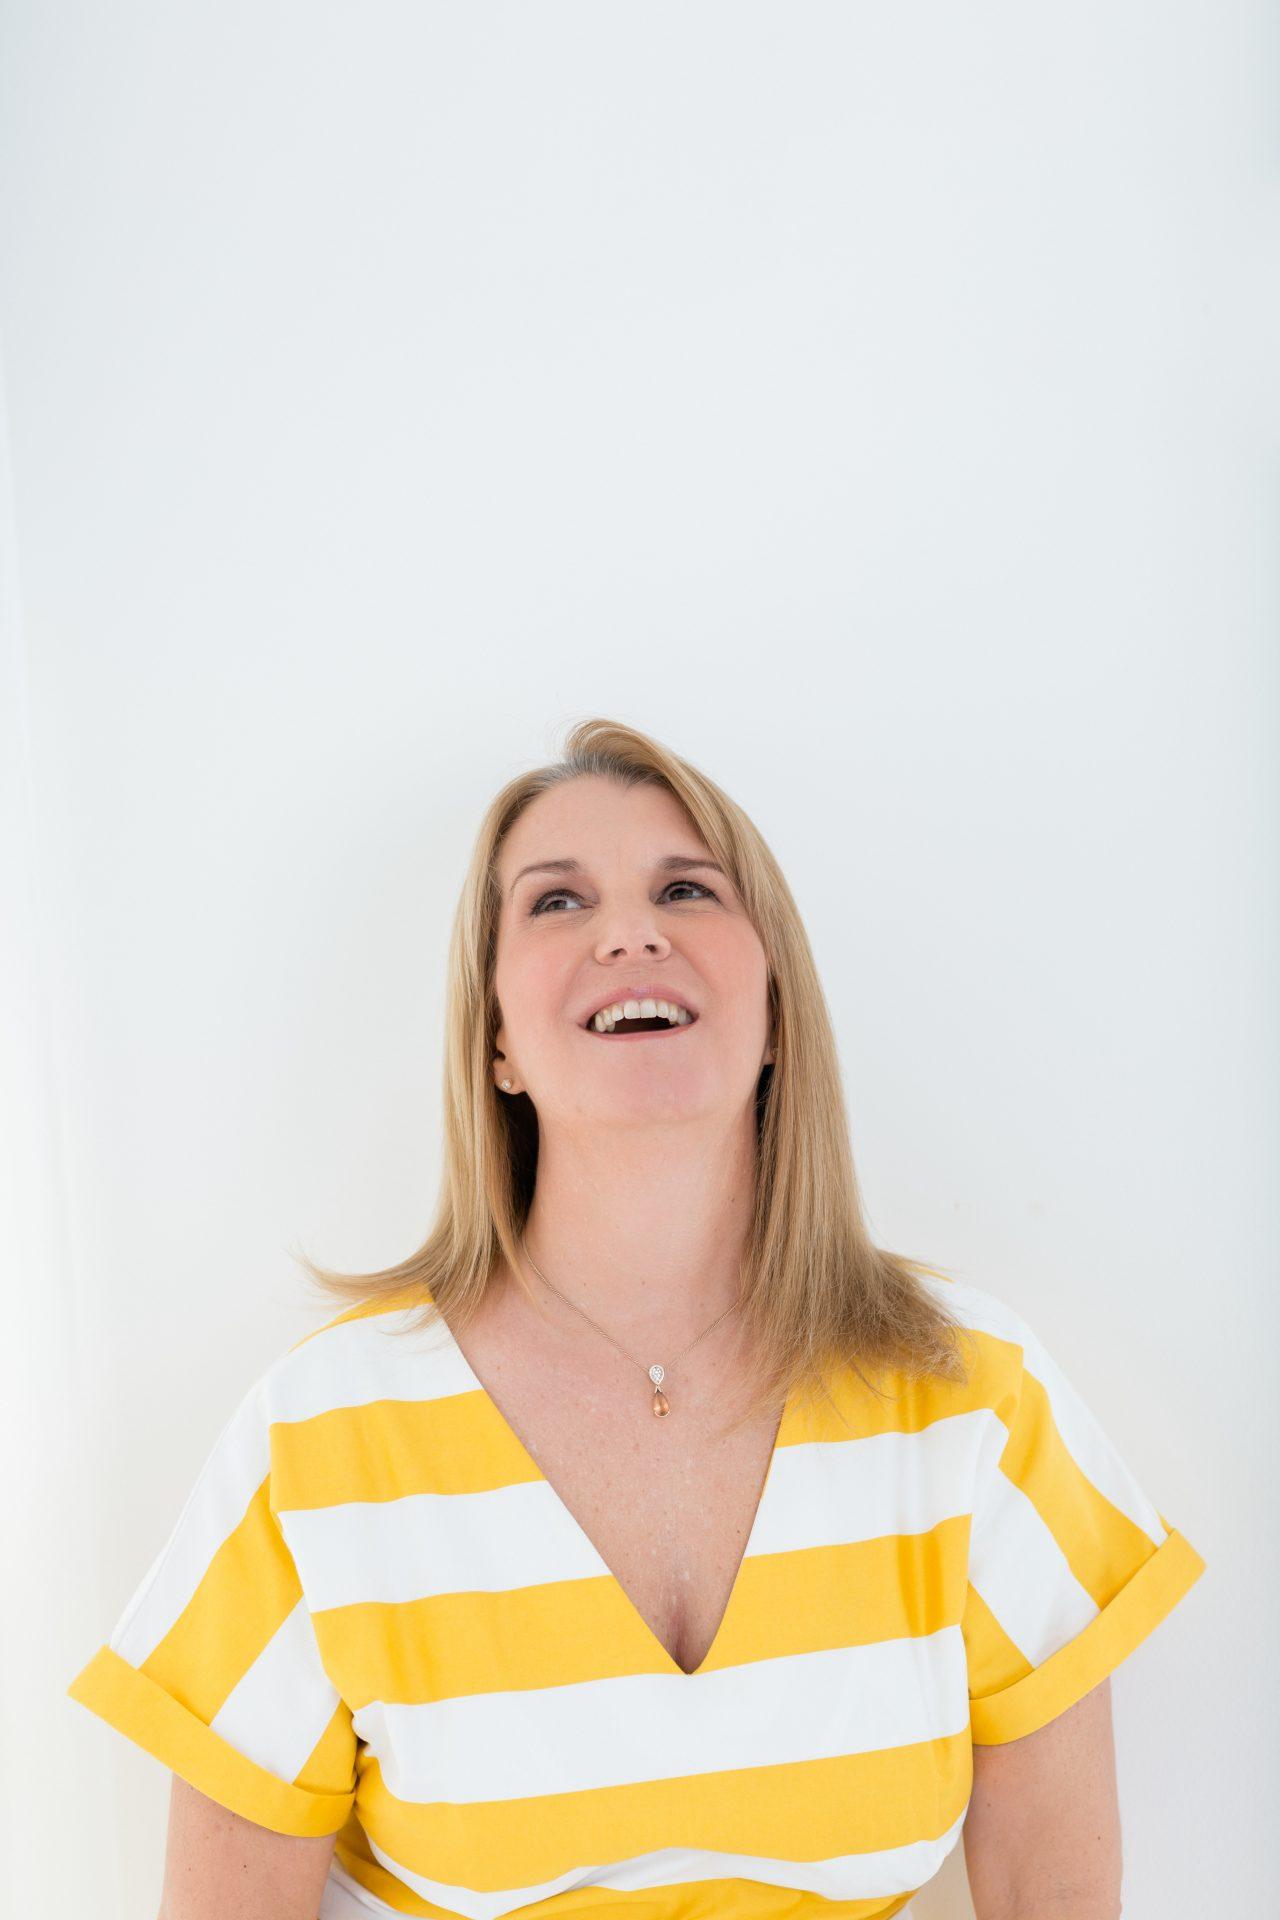 Yvette Craig by Kate Hennessy Business & Branding Photographer